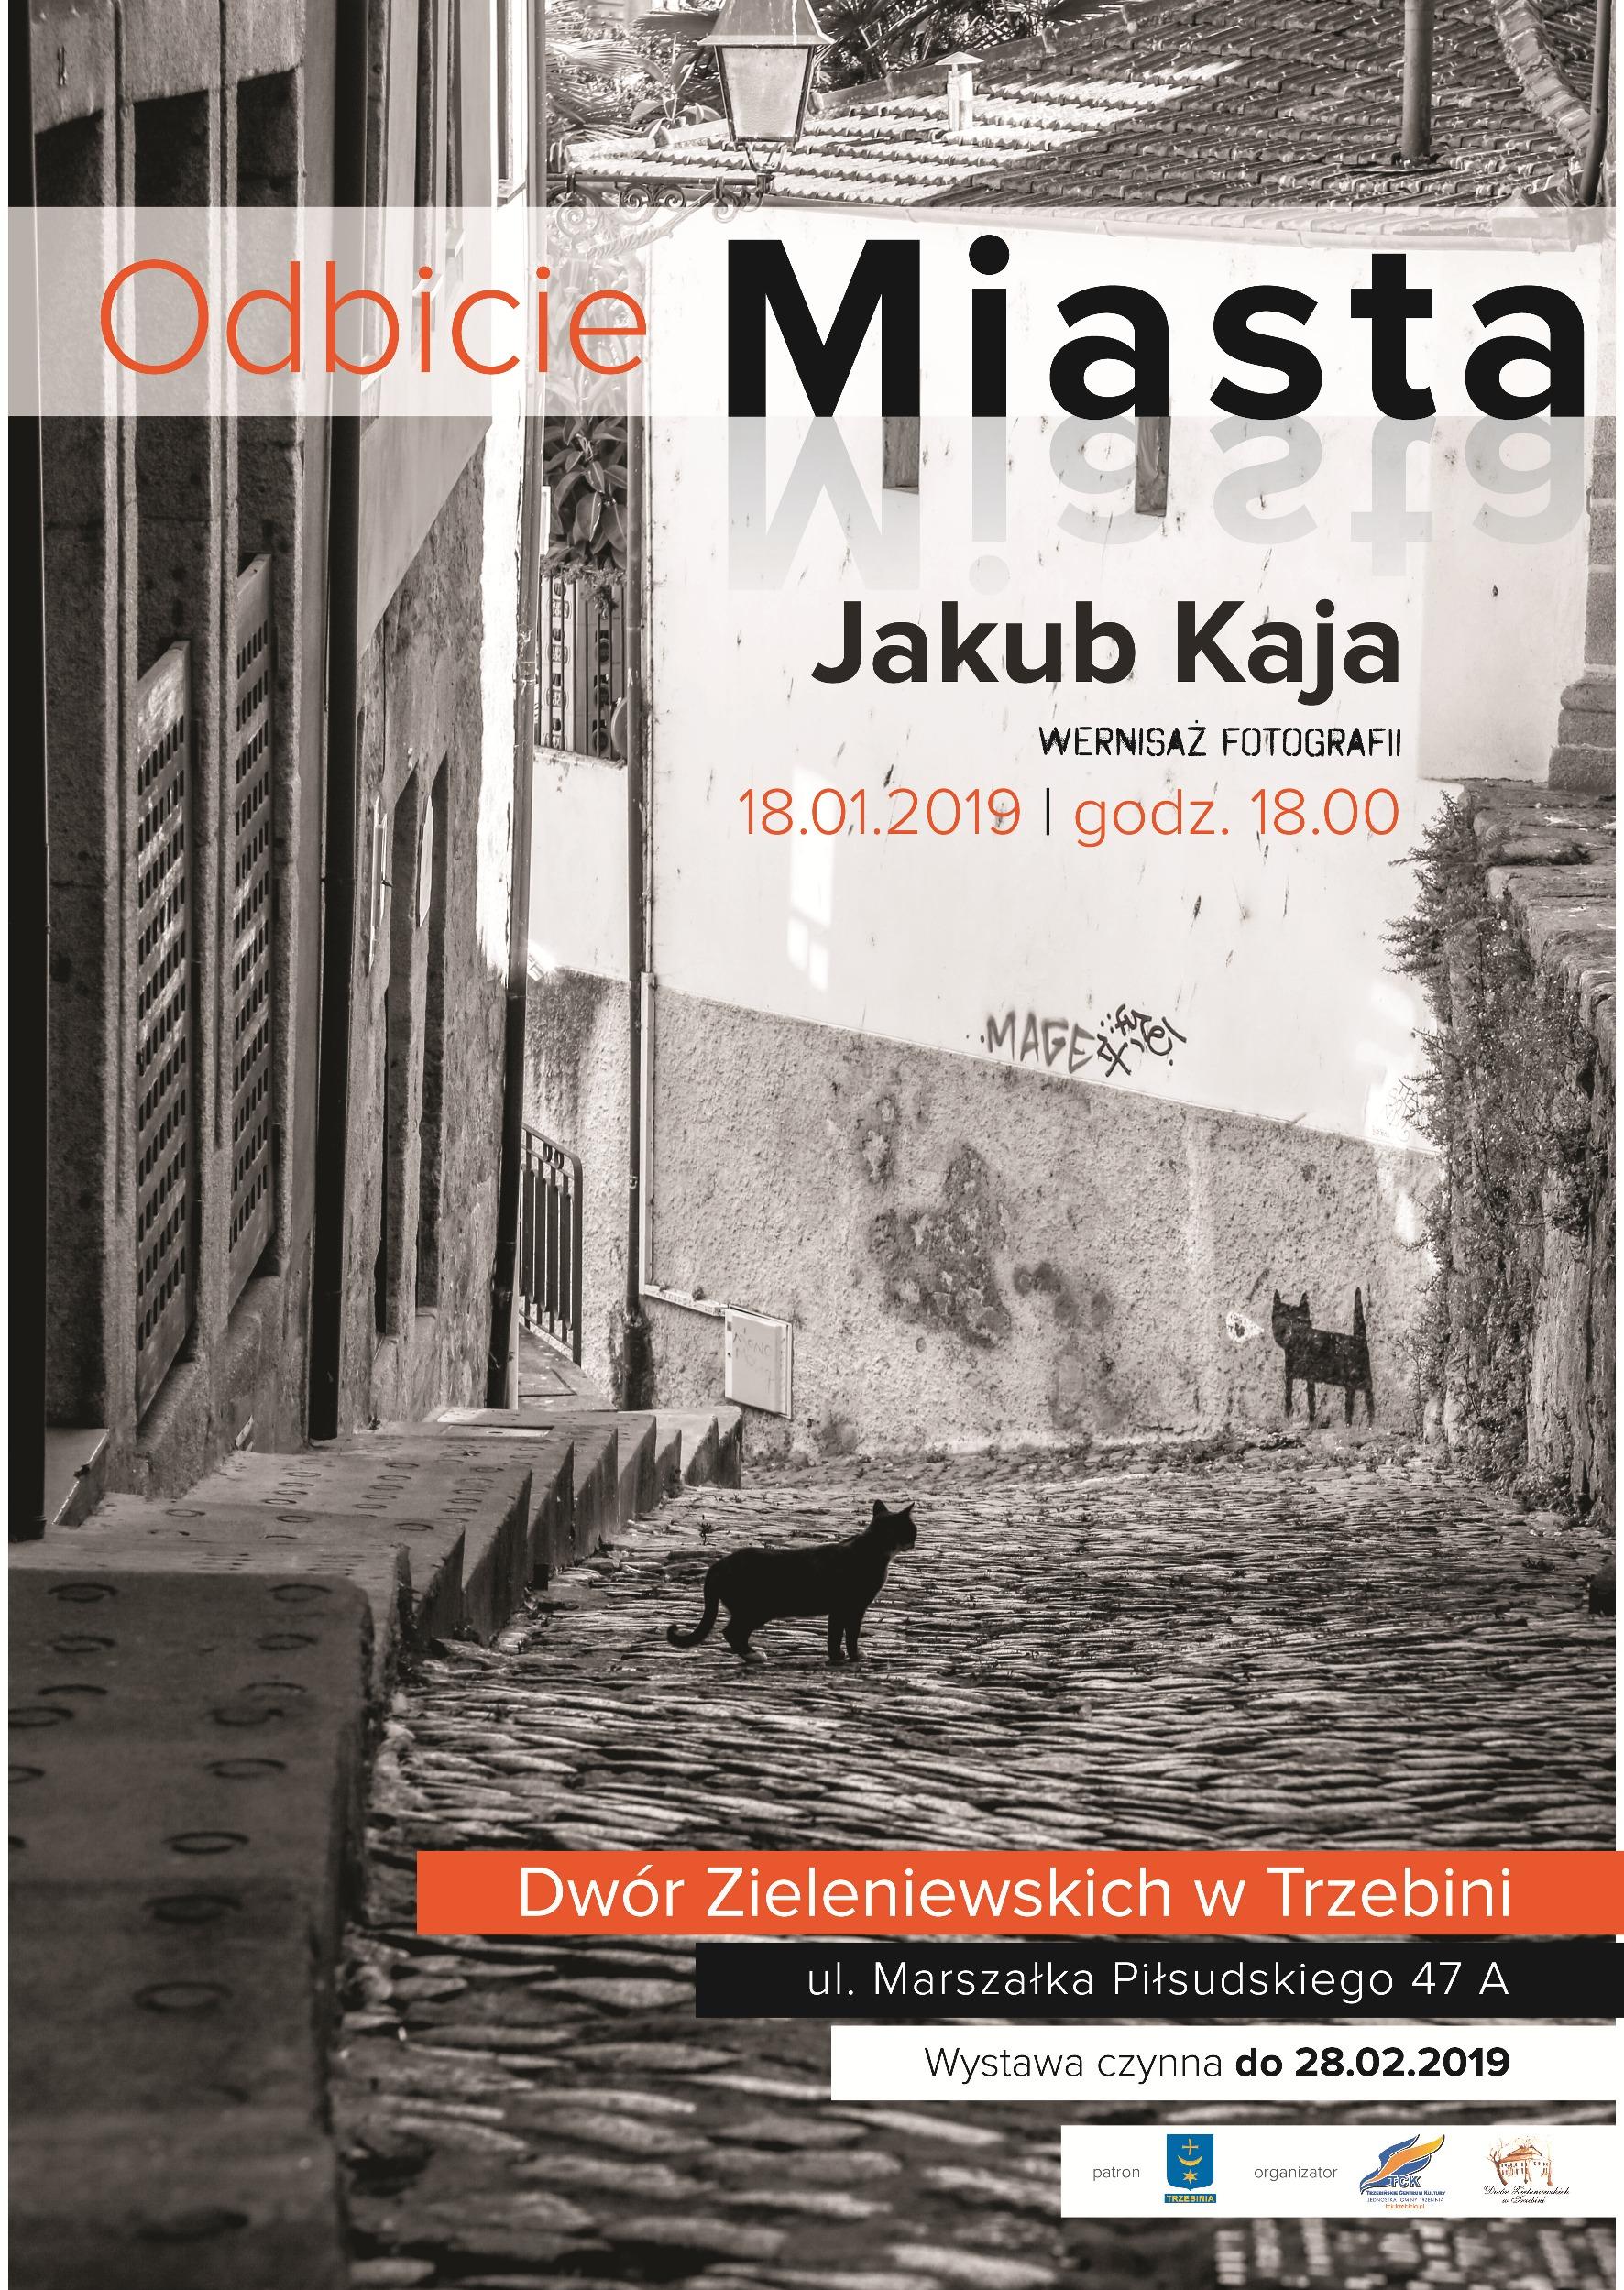 Wystawa fotografii Jakuba Kaji